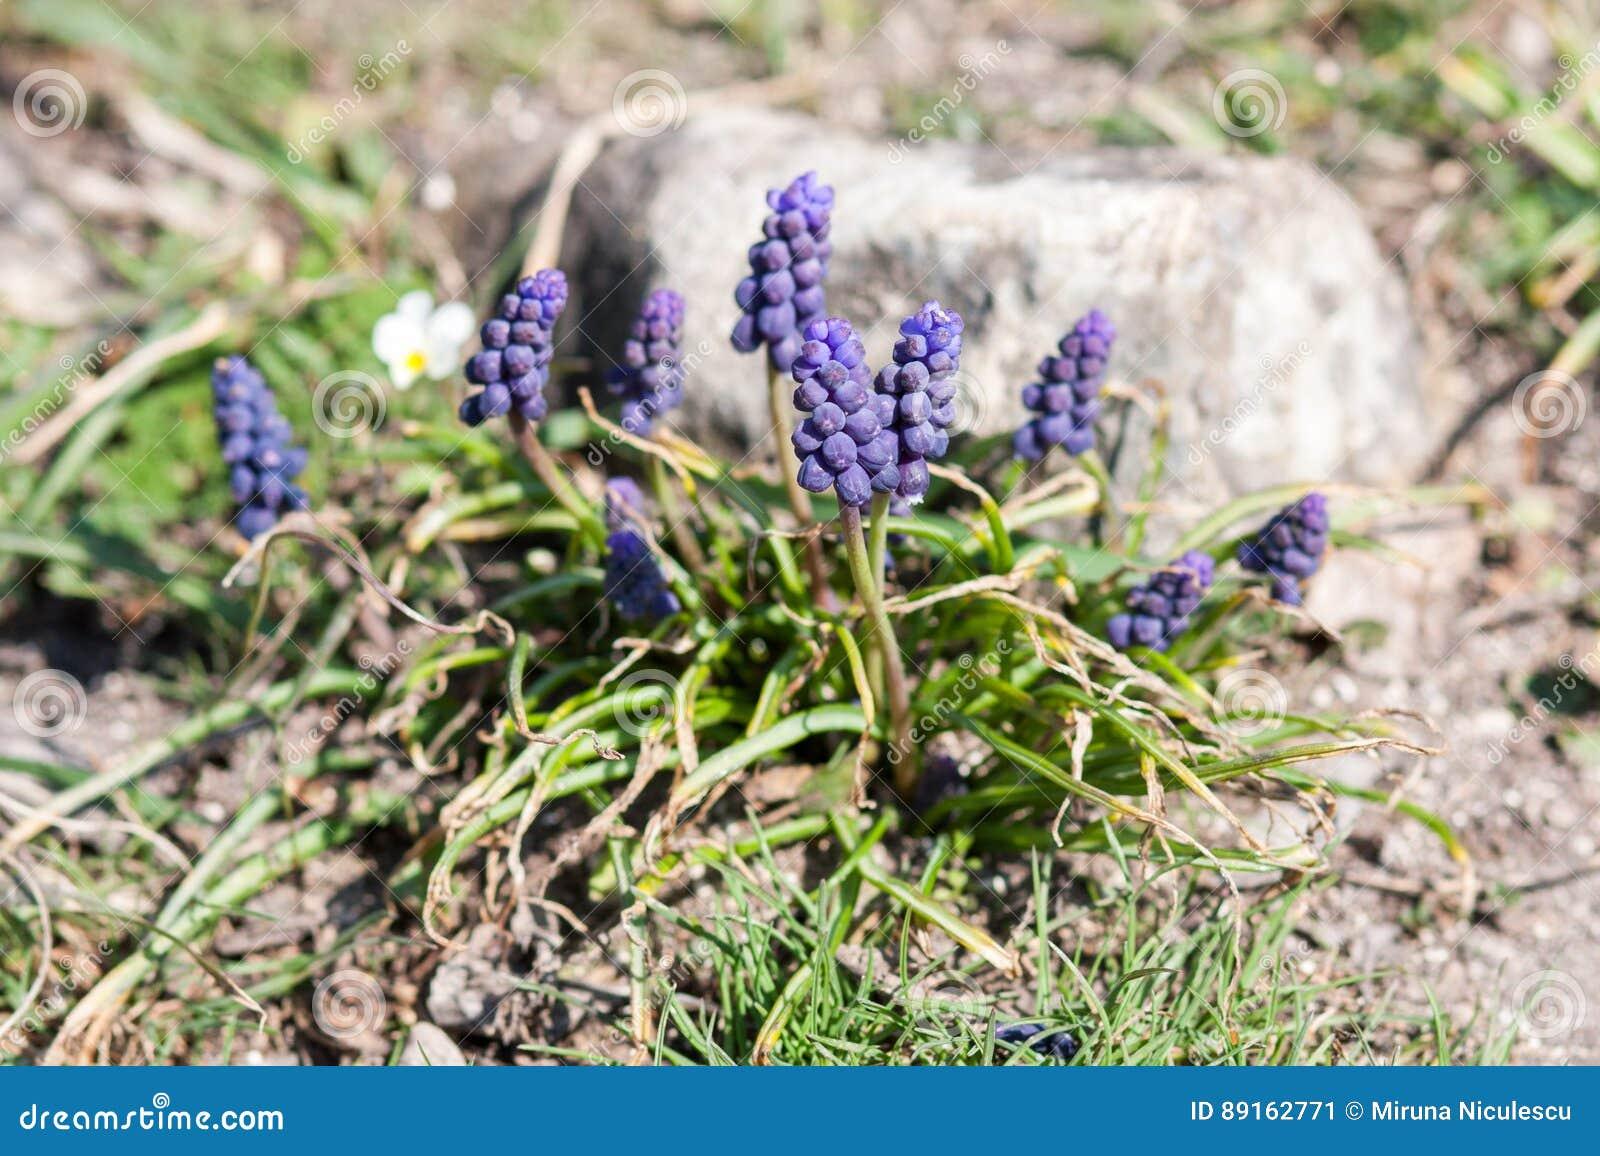 Muscari armeniacum botryoides oder Traubenhyazinthe